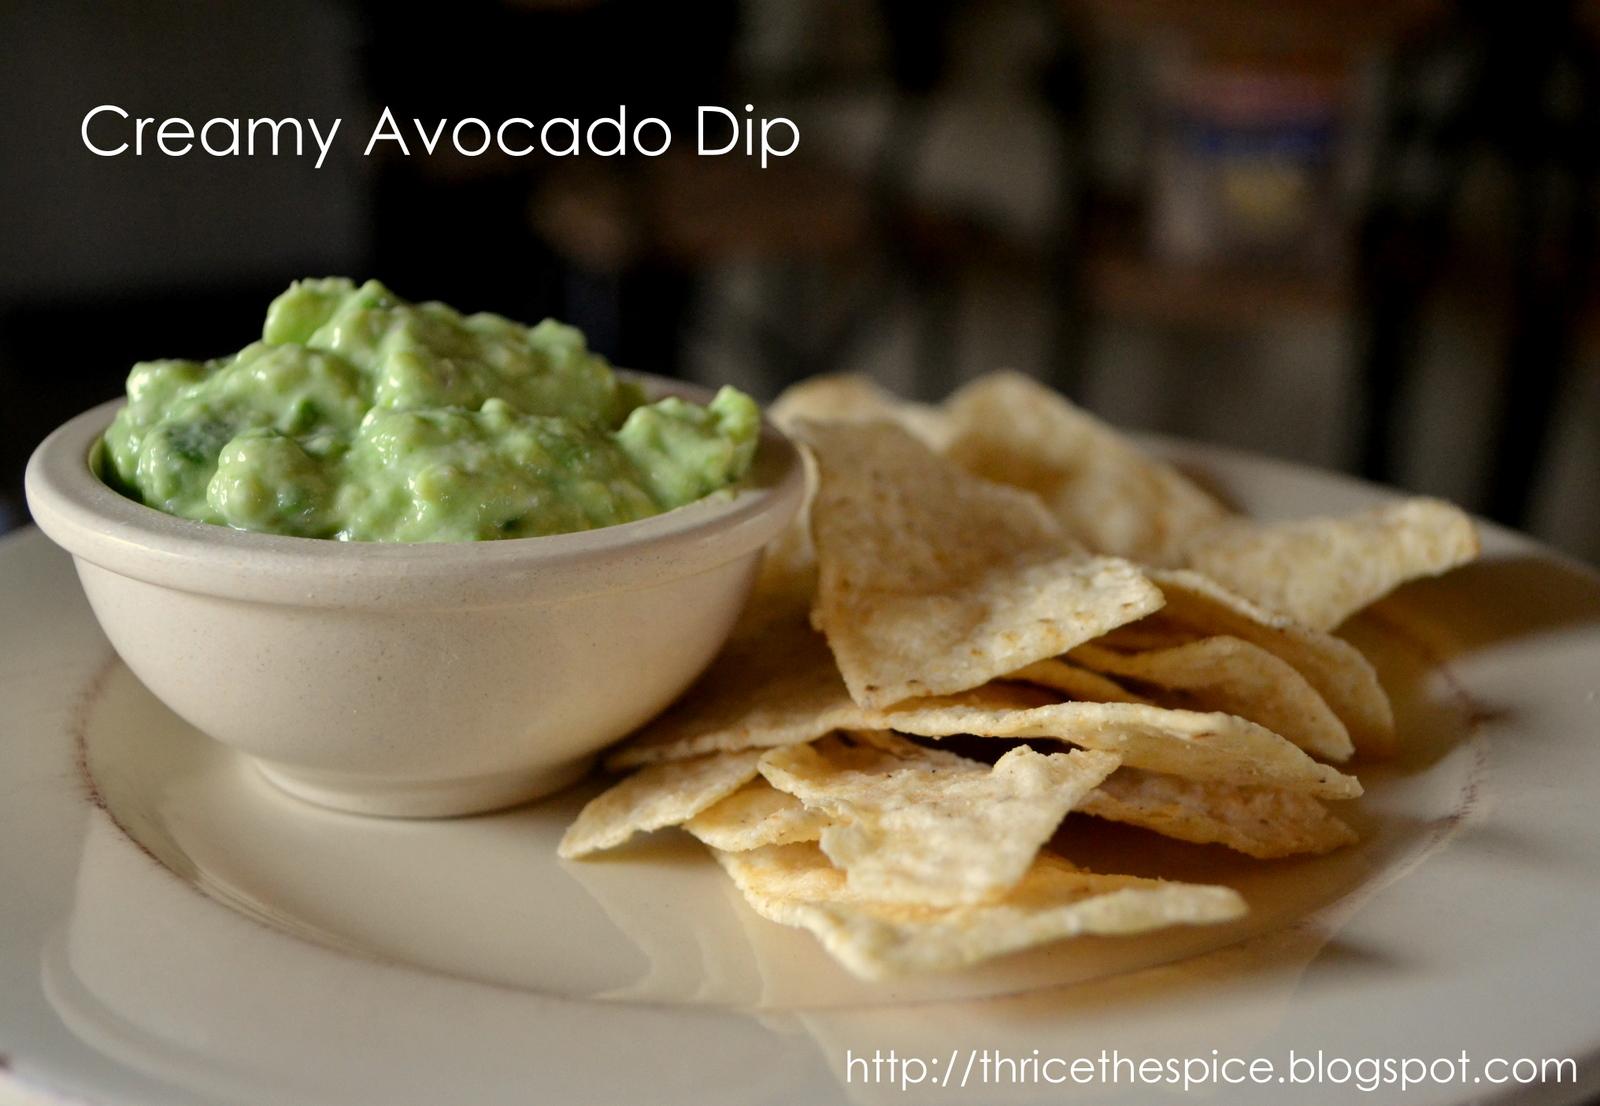 ThriceTheSpice: Creamy Avocado Dip